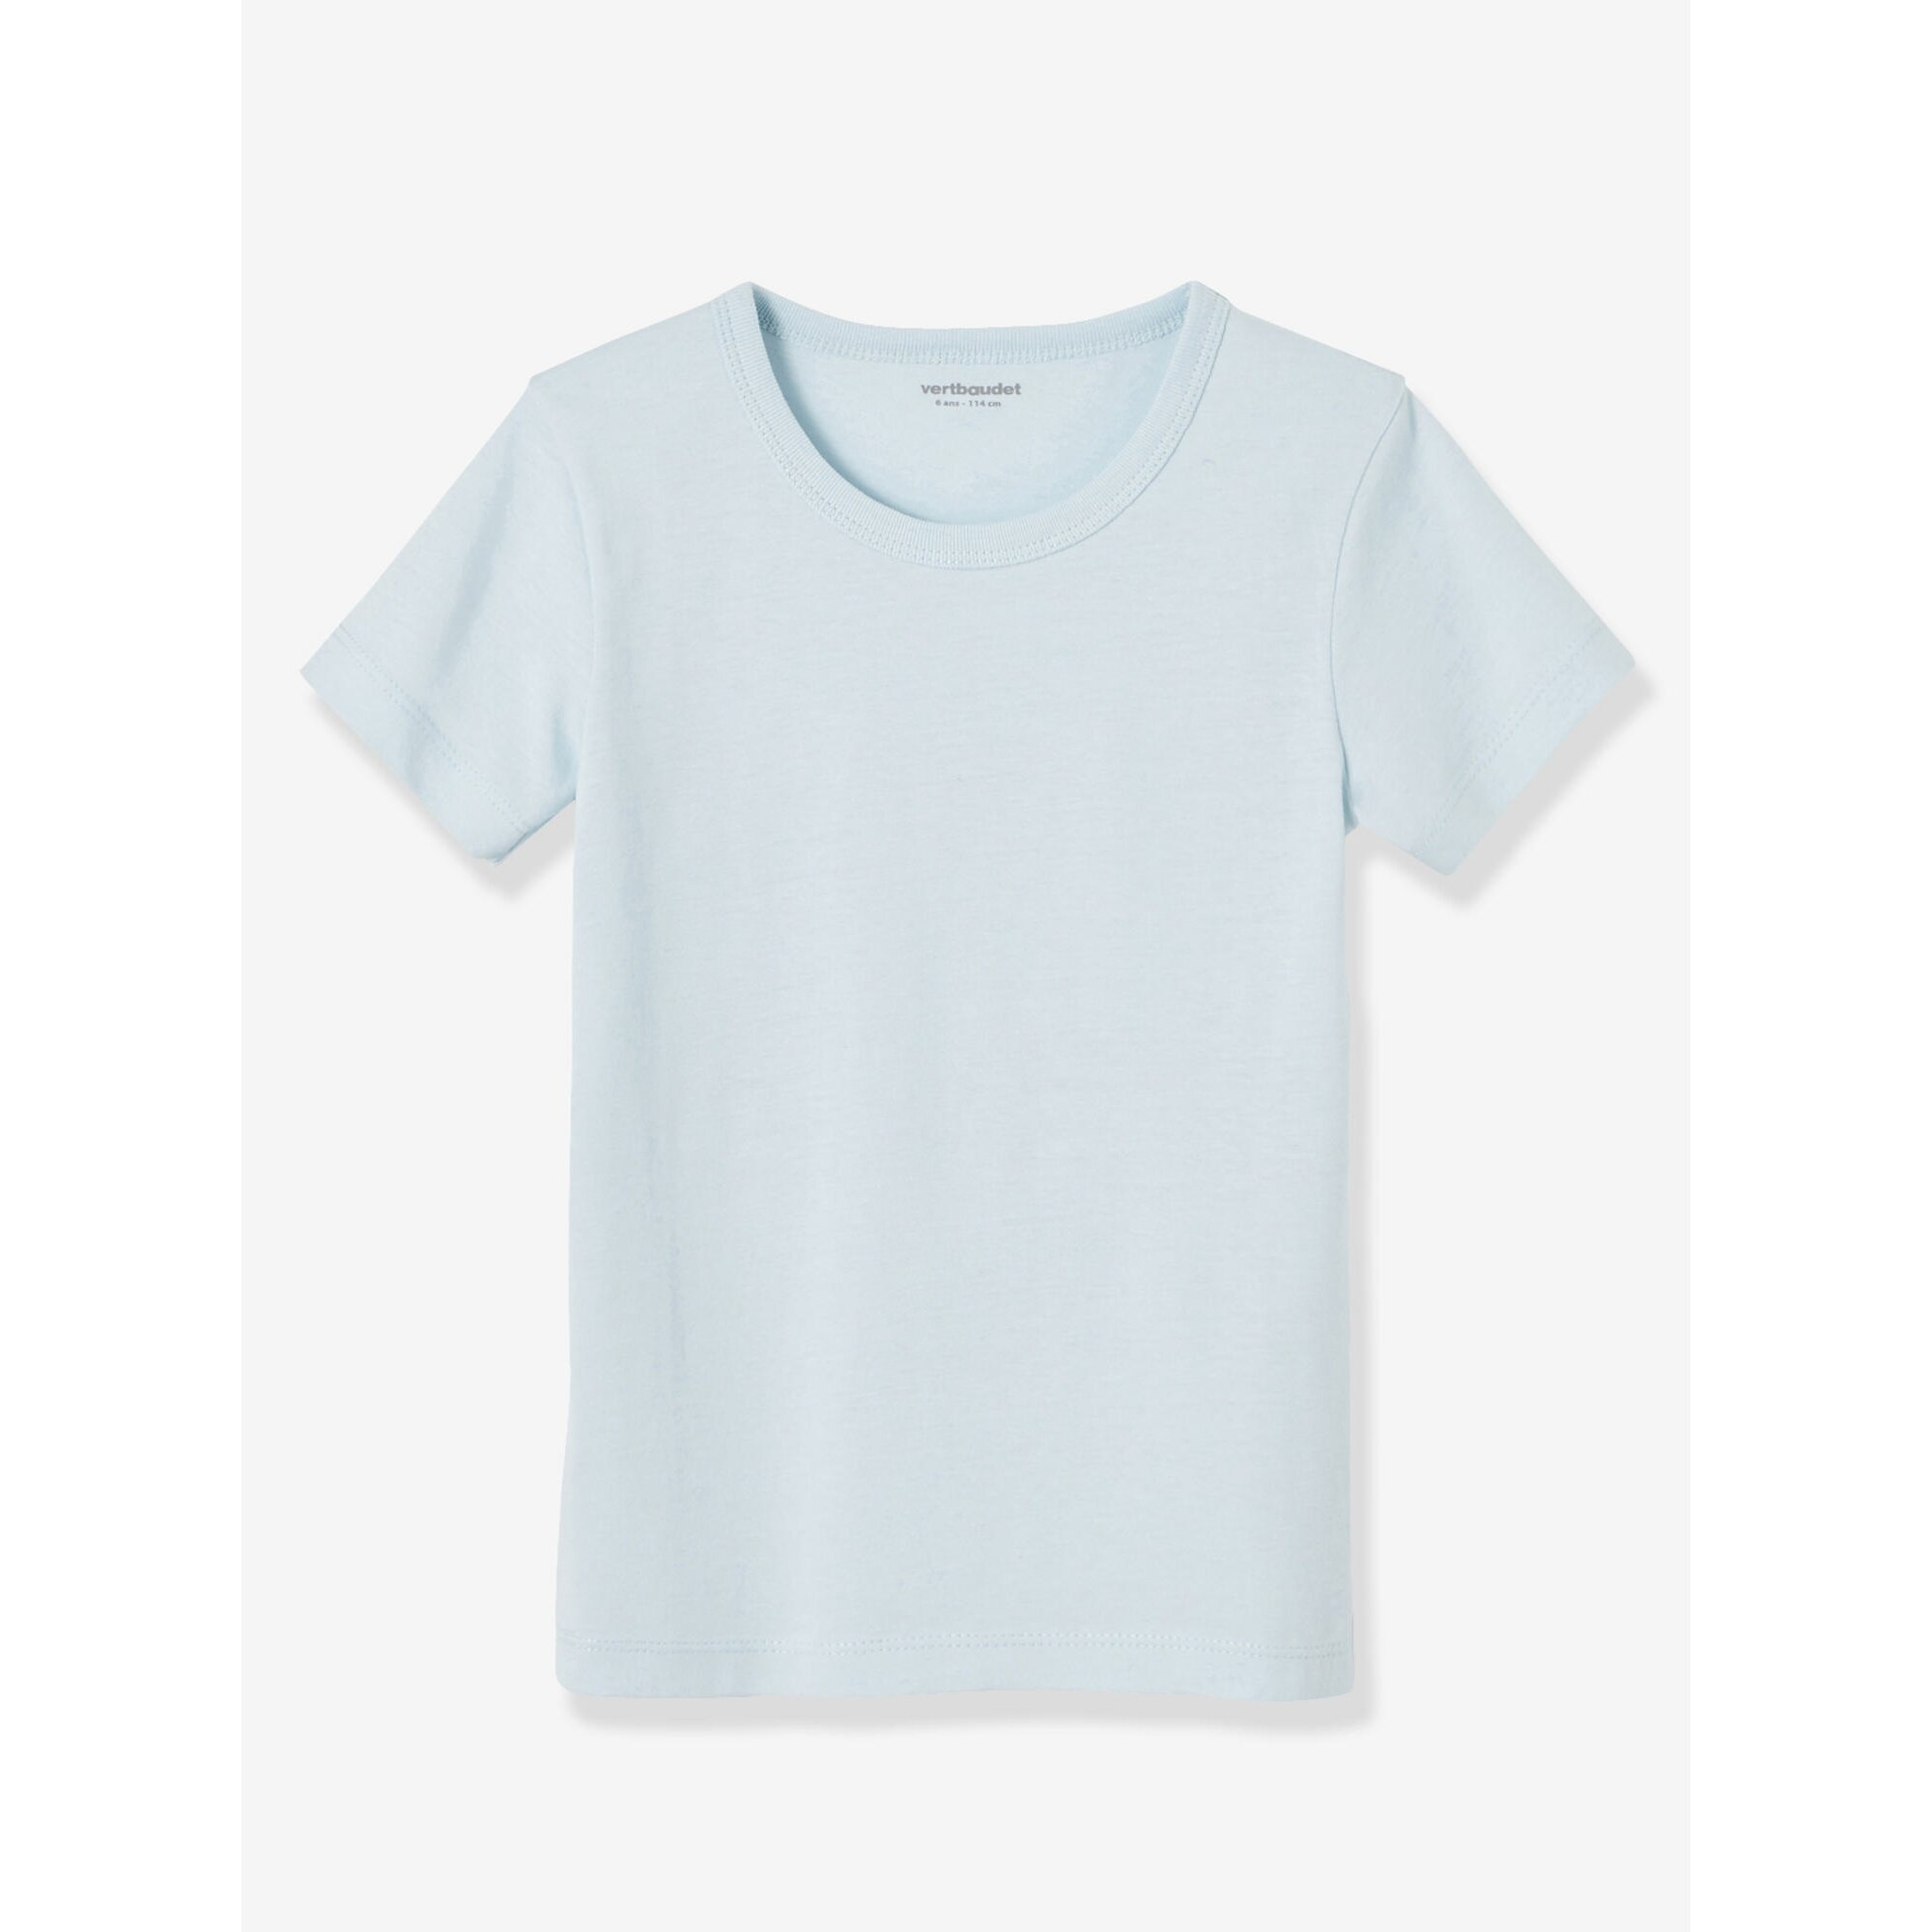 vertbaudet-happy-price-4er-pack-jungen-t-shirts-navy-